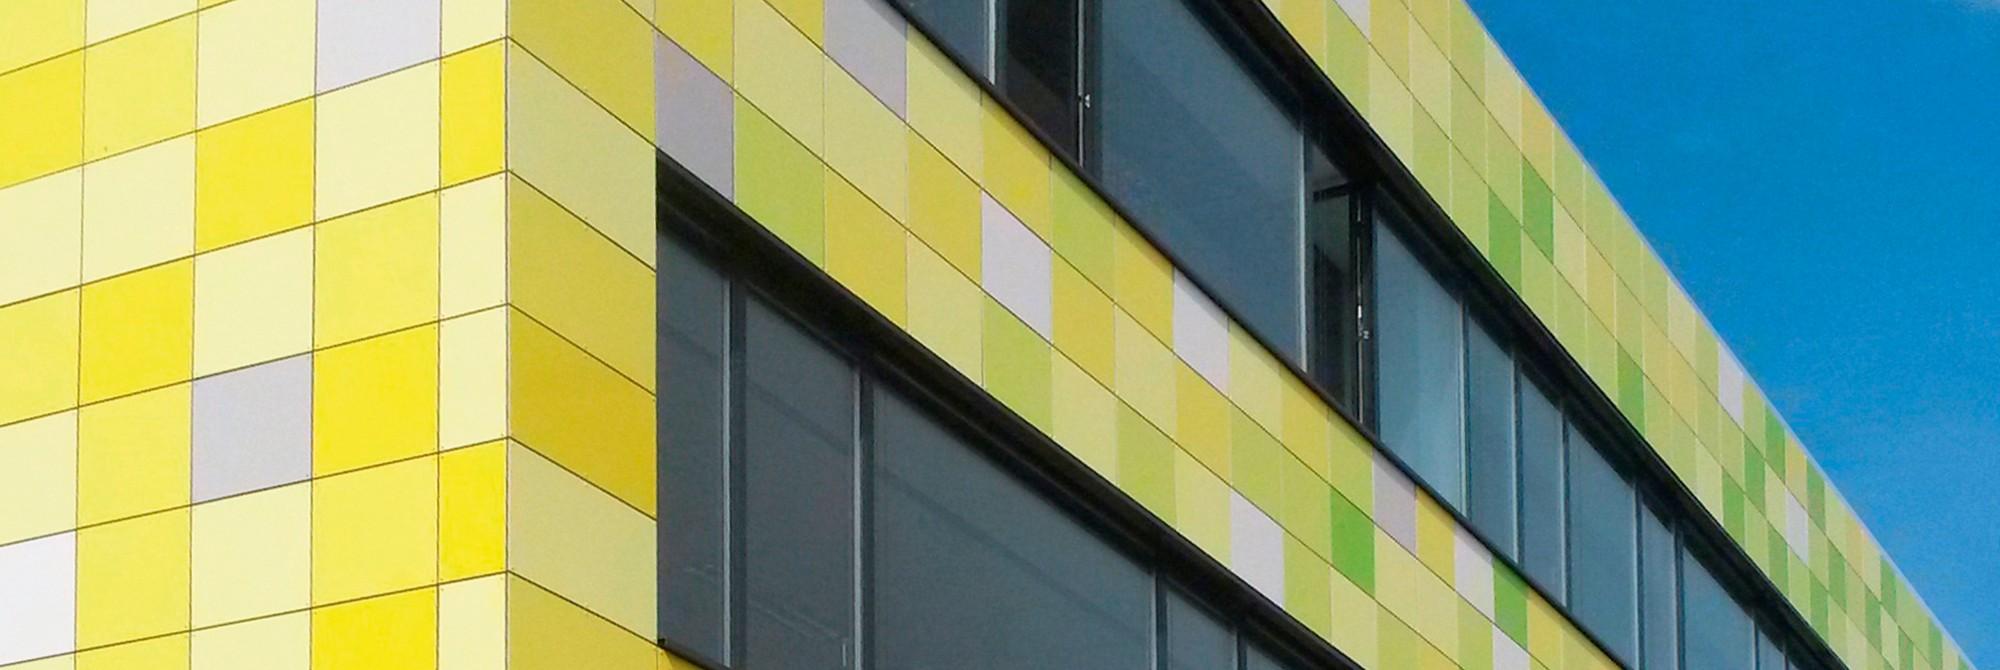 Fassadenbau - Alupanel